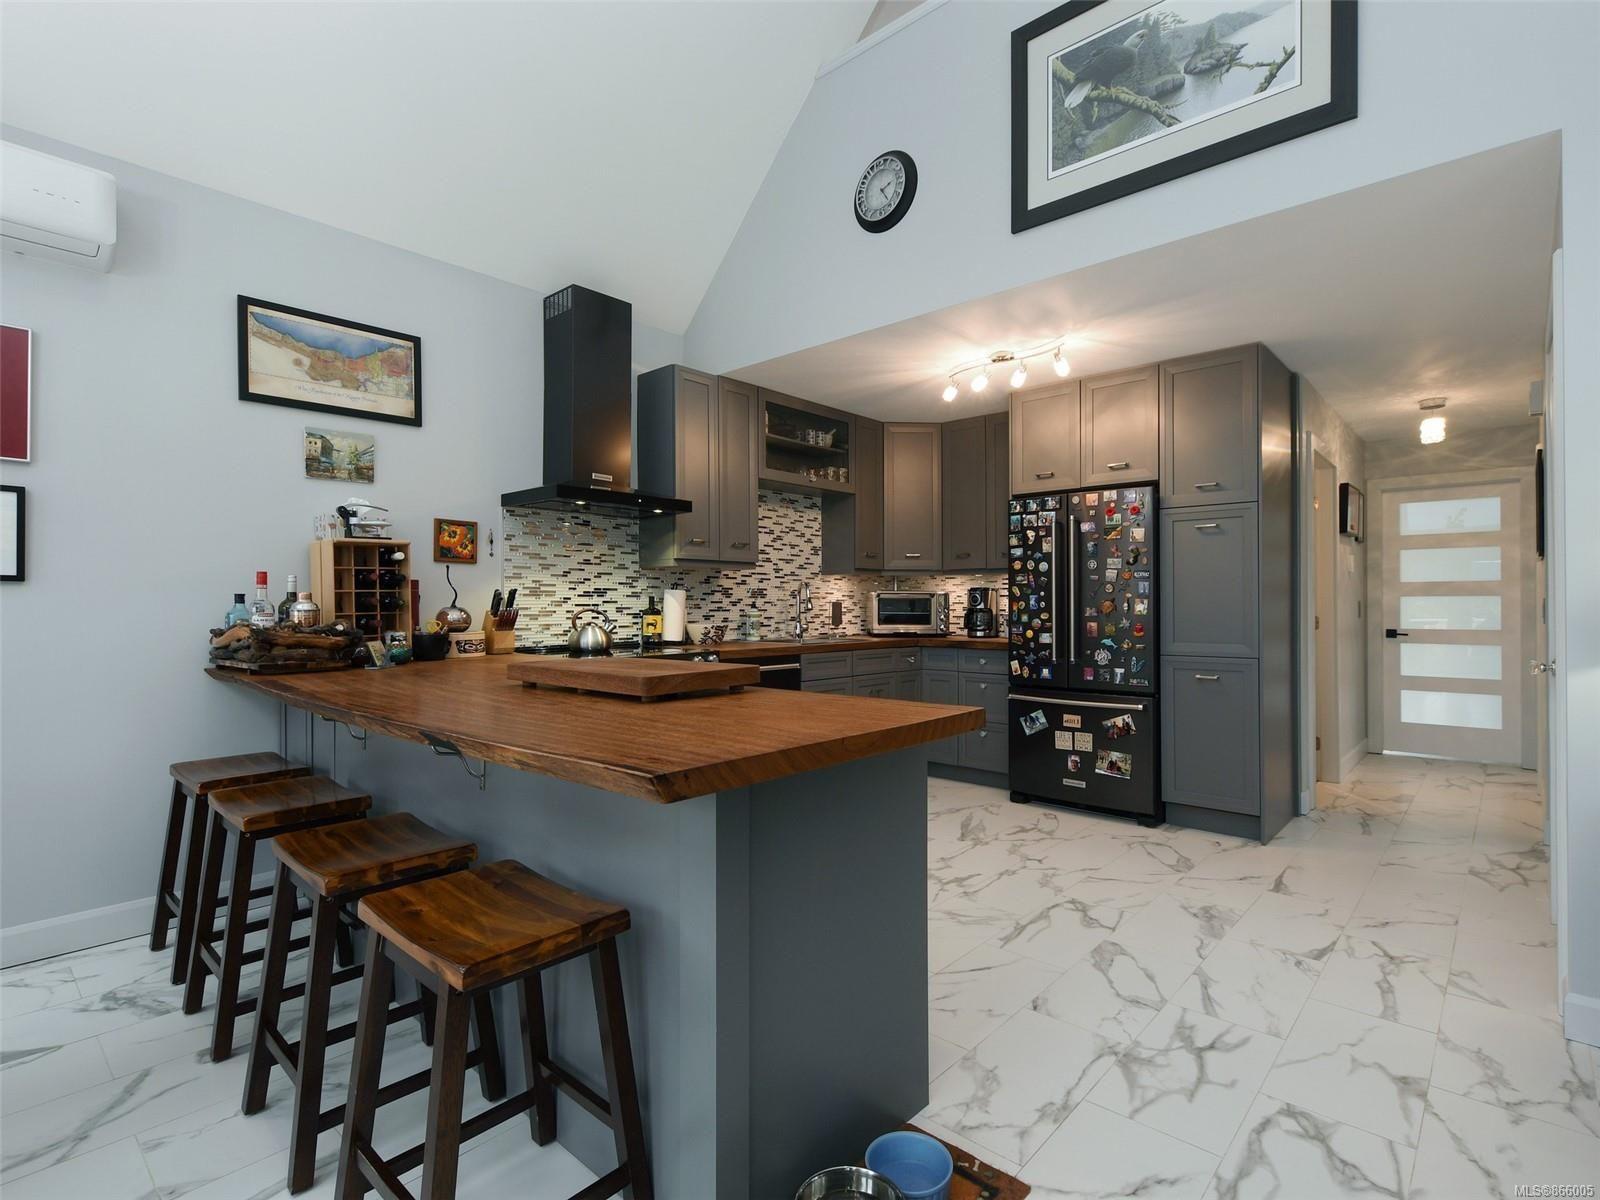 Photo 7: Photos: 5739 Siasong Rd in : Sk Saseenos House for sale (Sooke)  : MLS®# 866005